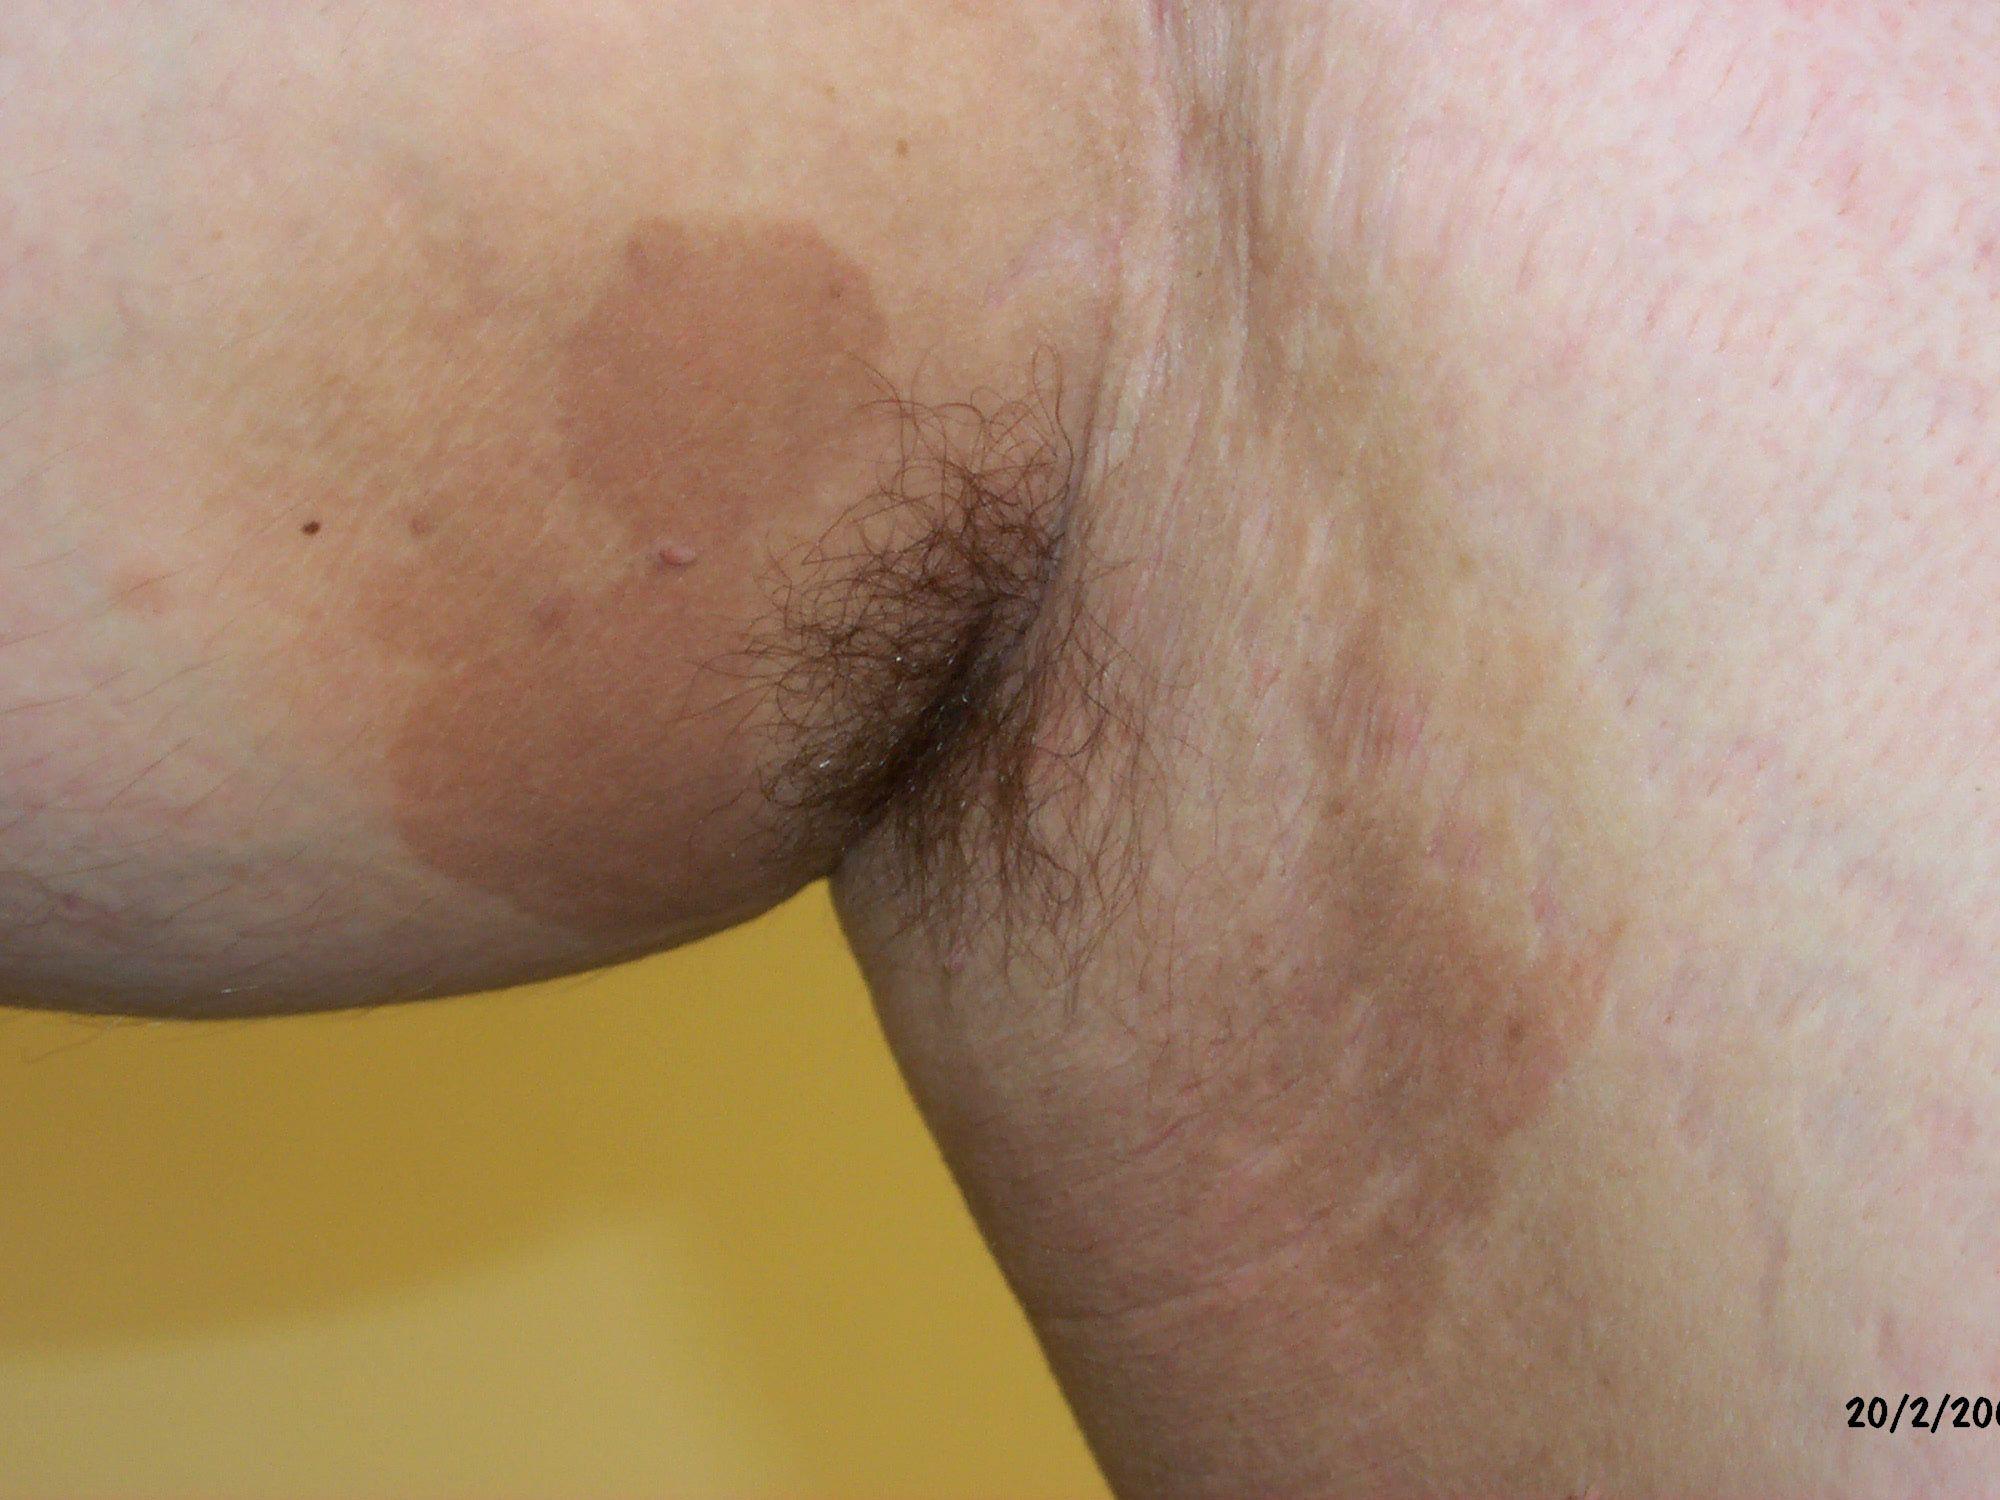 Erythrasma Symptoms Causes Diagnosis And Treatment